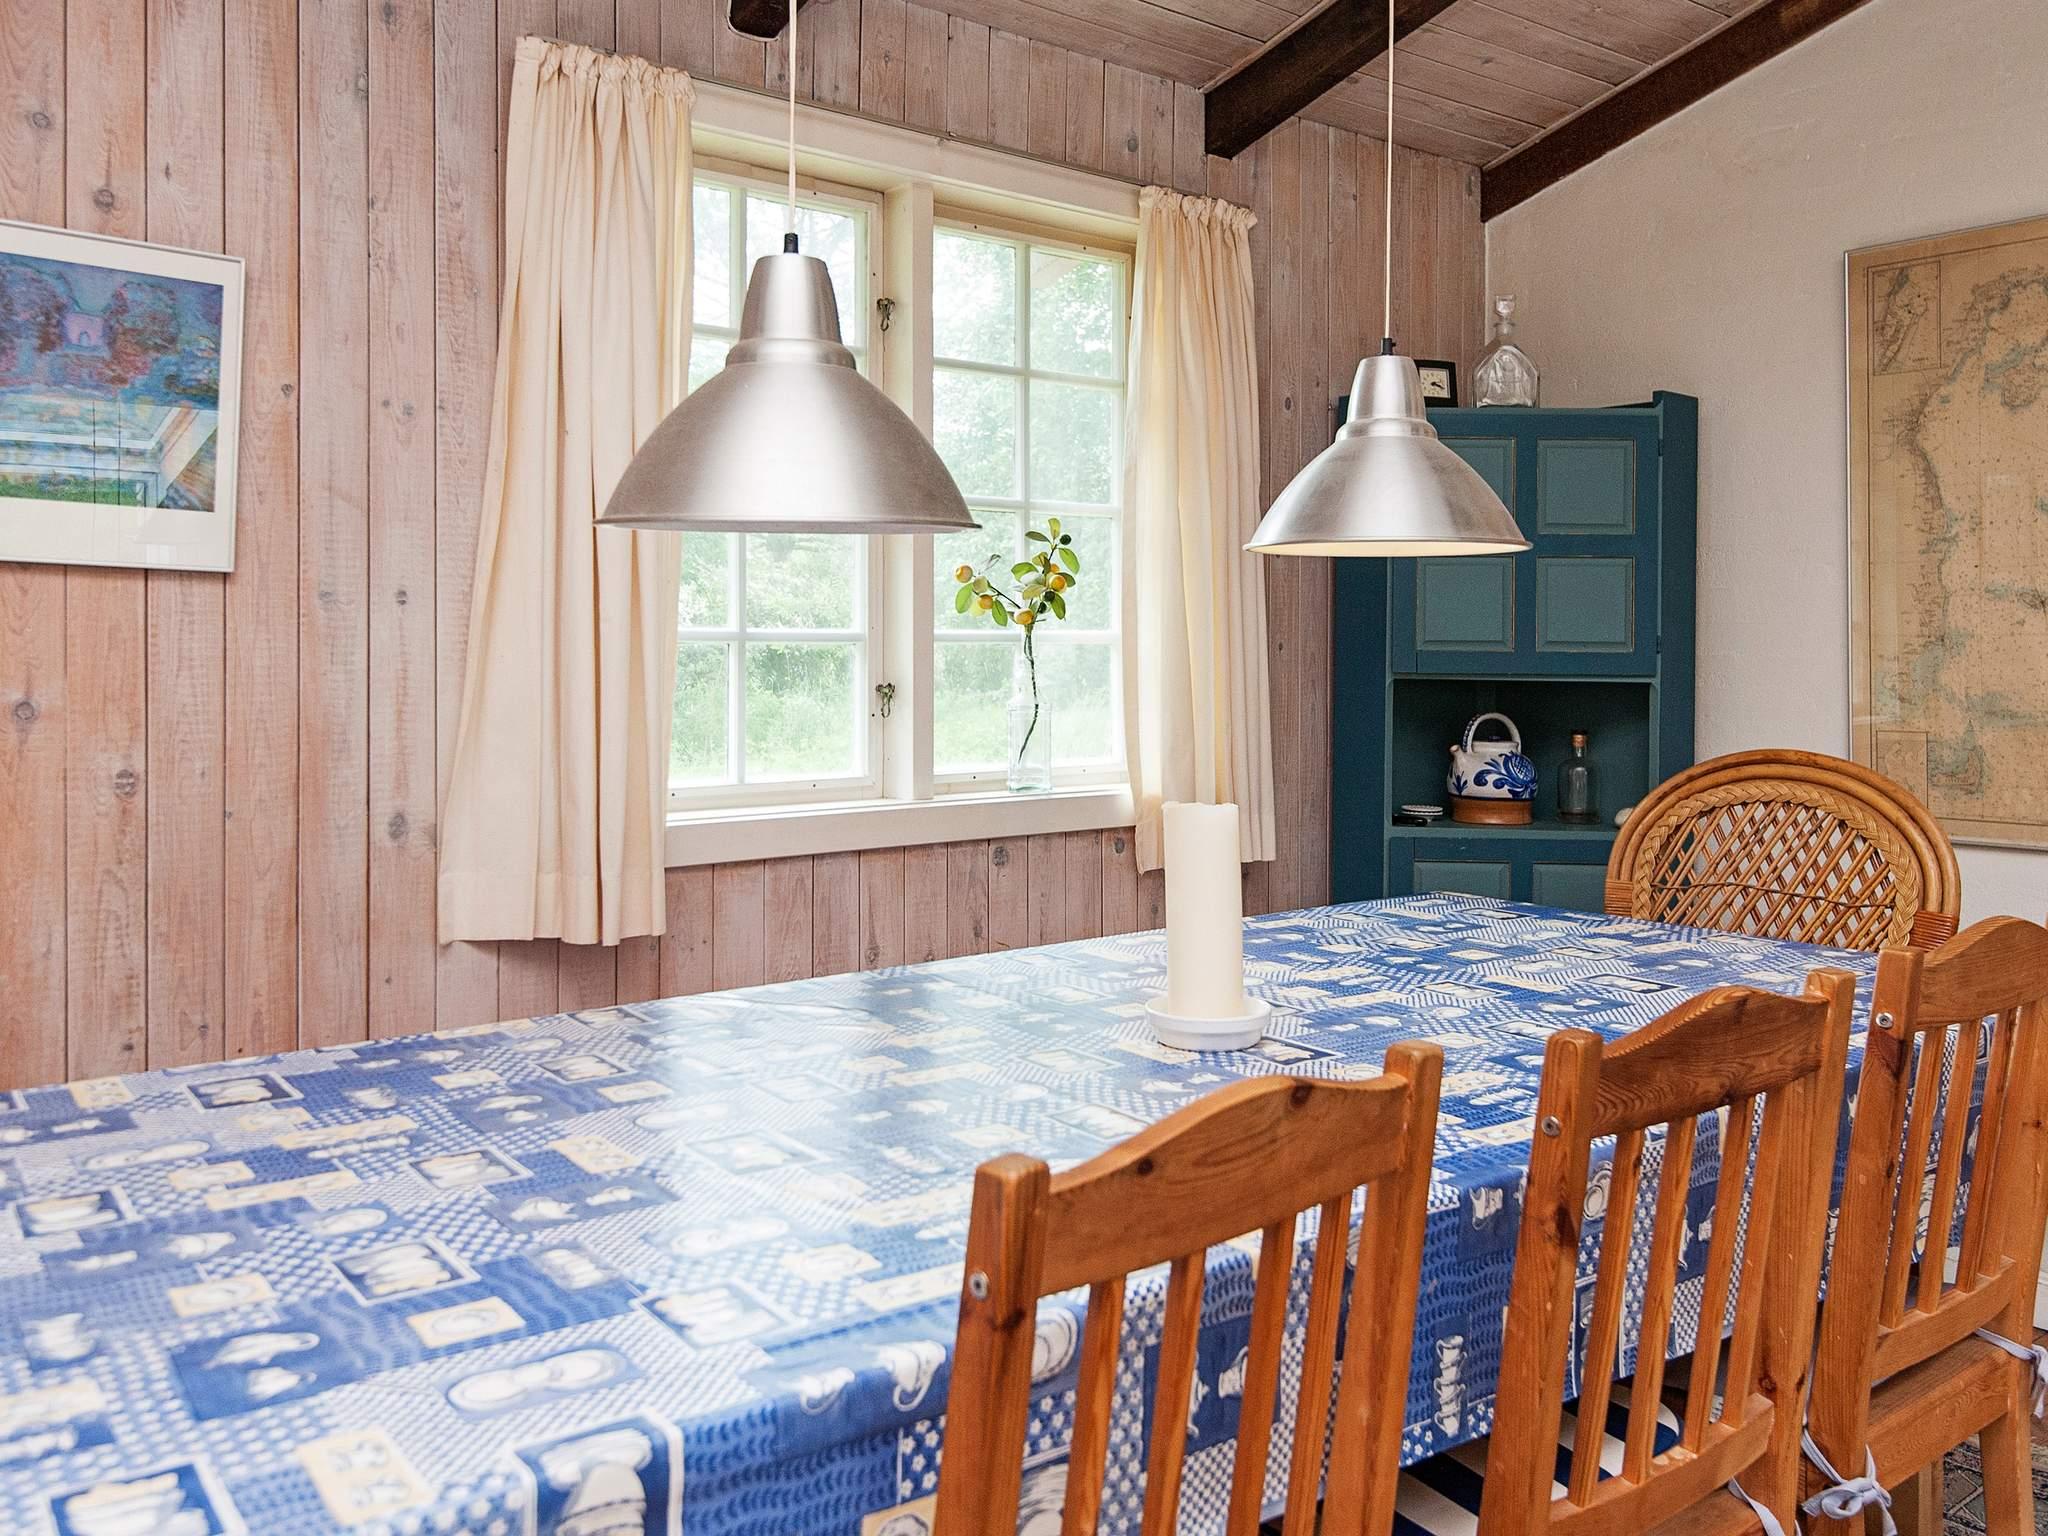 Maison de vacances Helgenæs (2354348), Knebel, , Mer Baltique danoise, Danemark, image 4